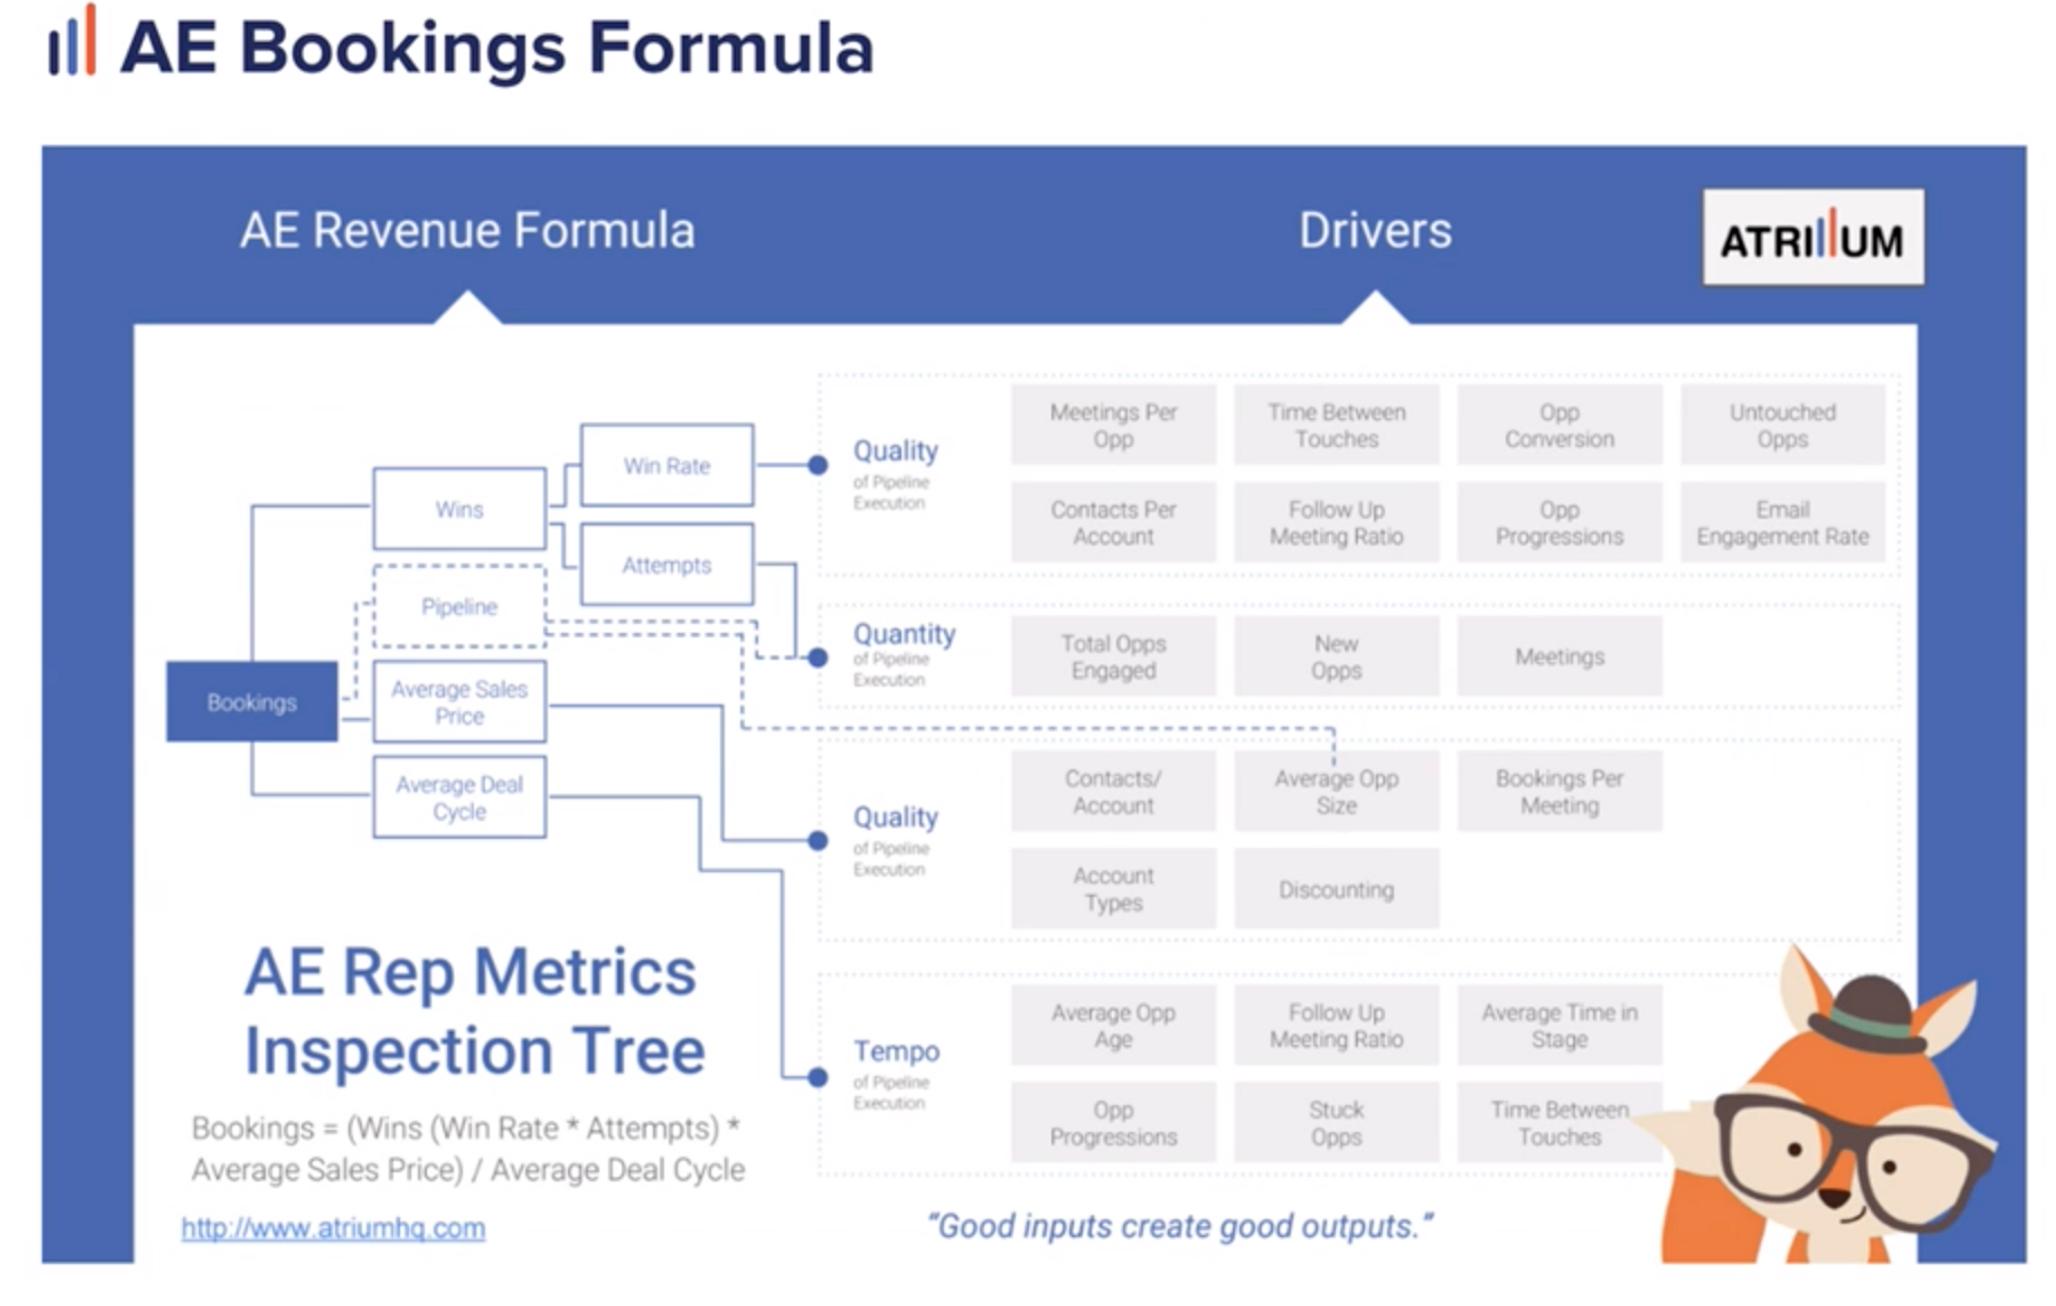 Diagram of up-funnel metrics for AE bookings formula